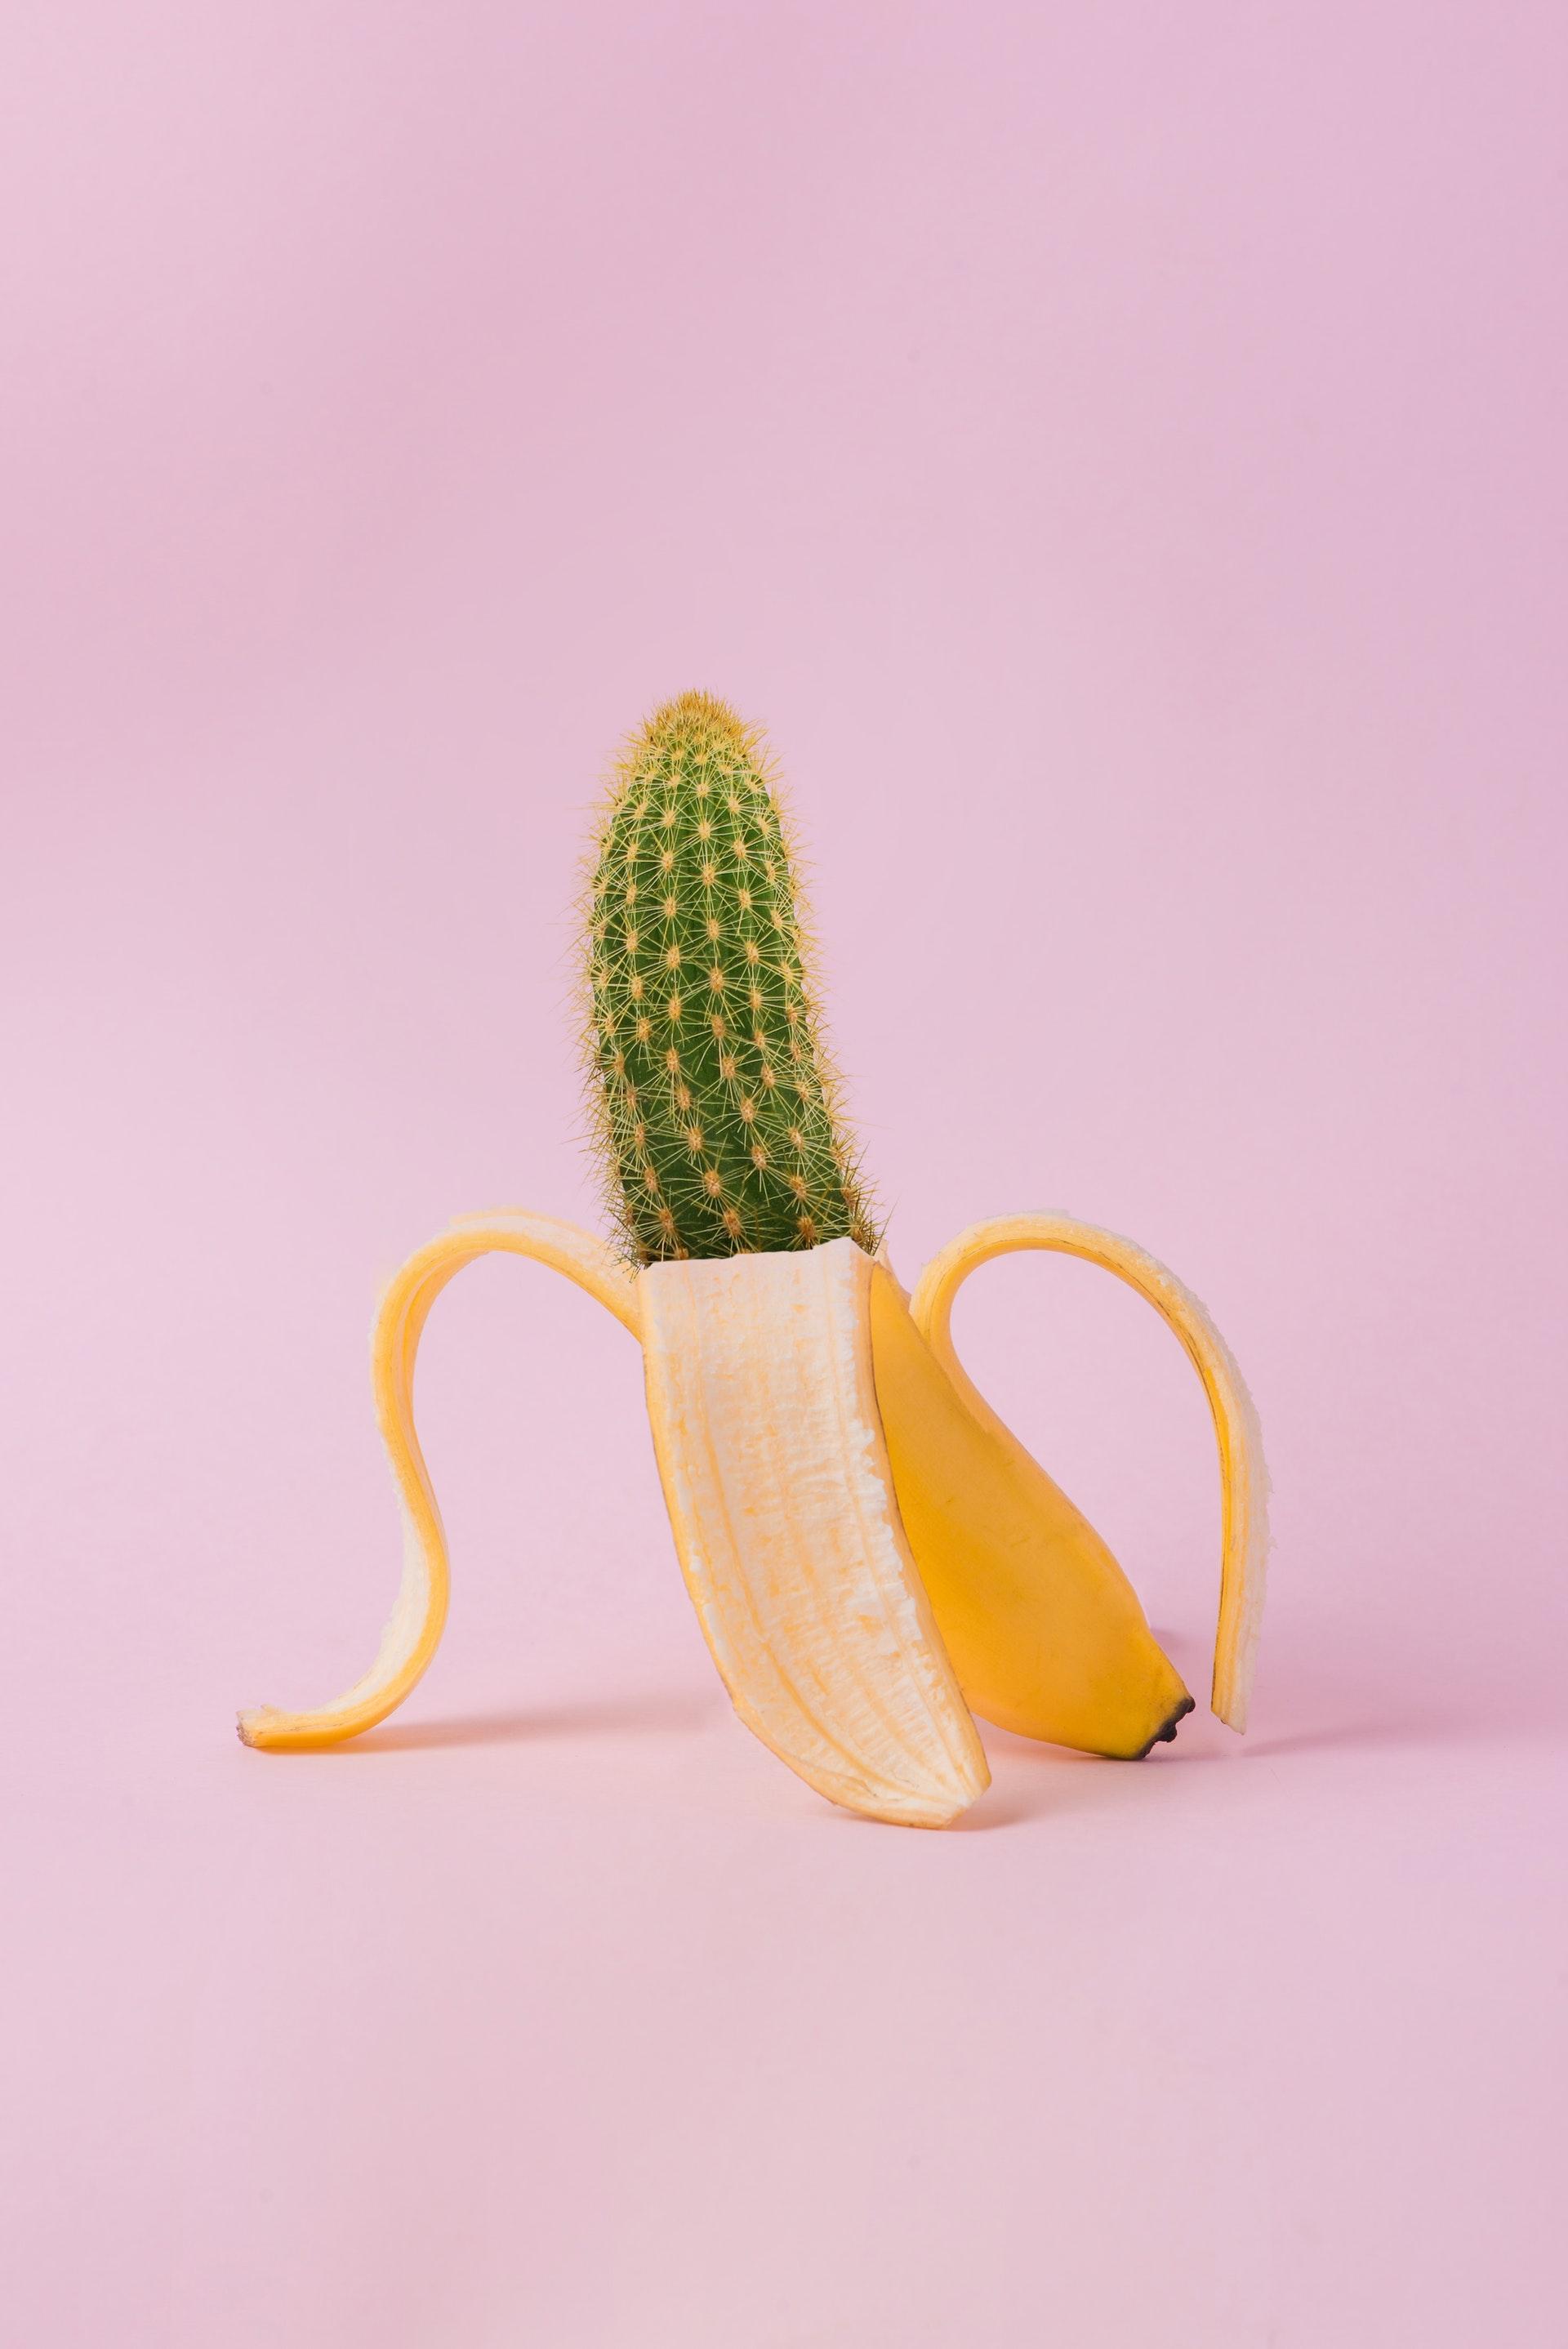 Cactus_Banana